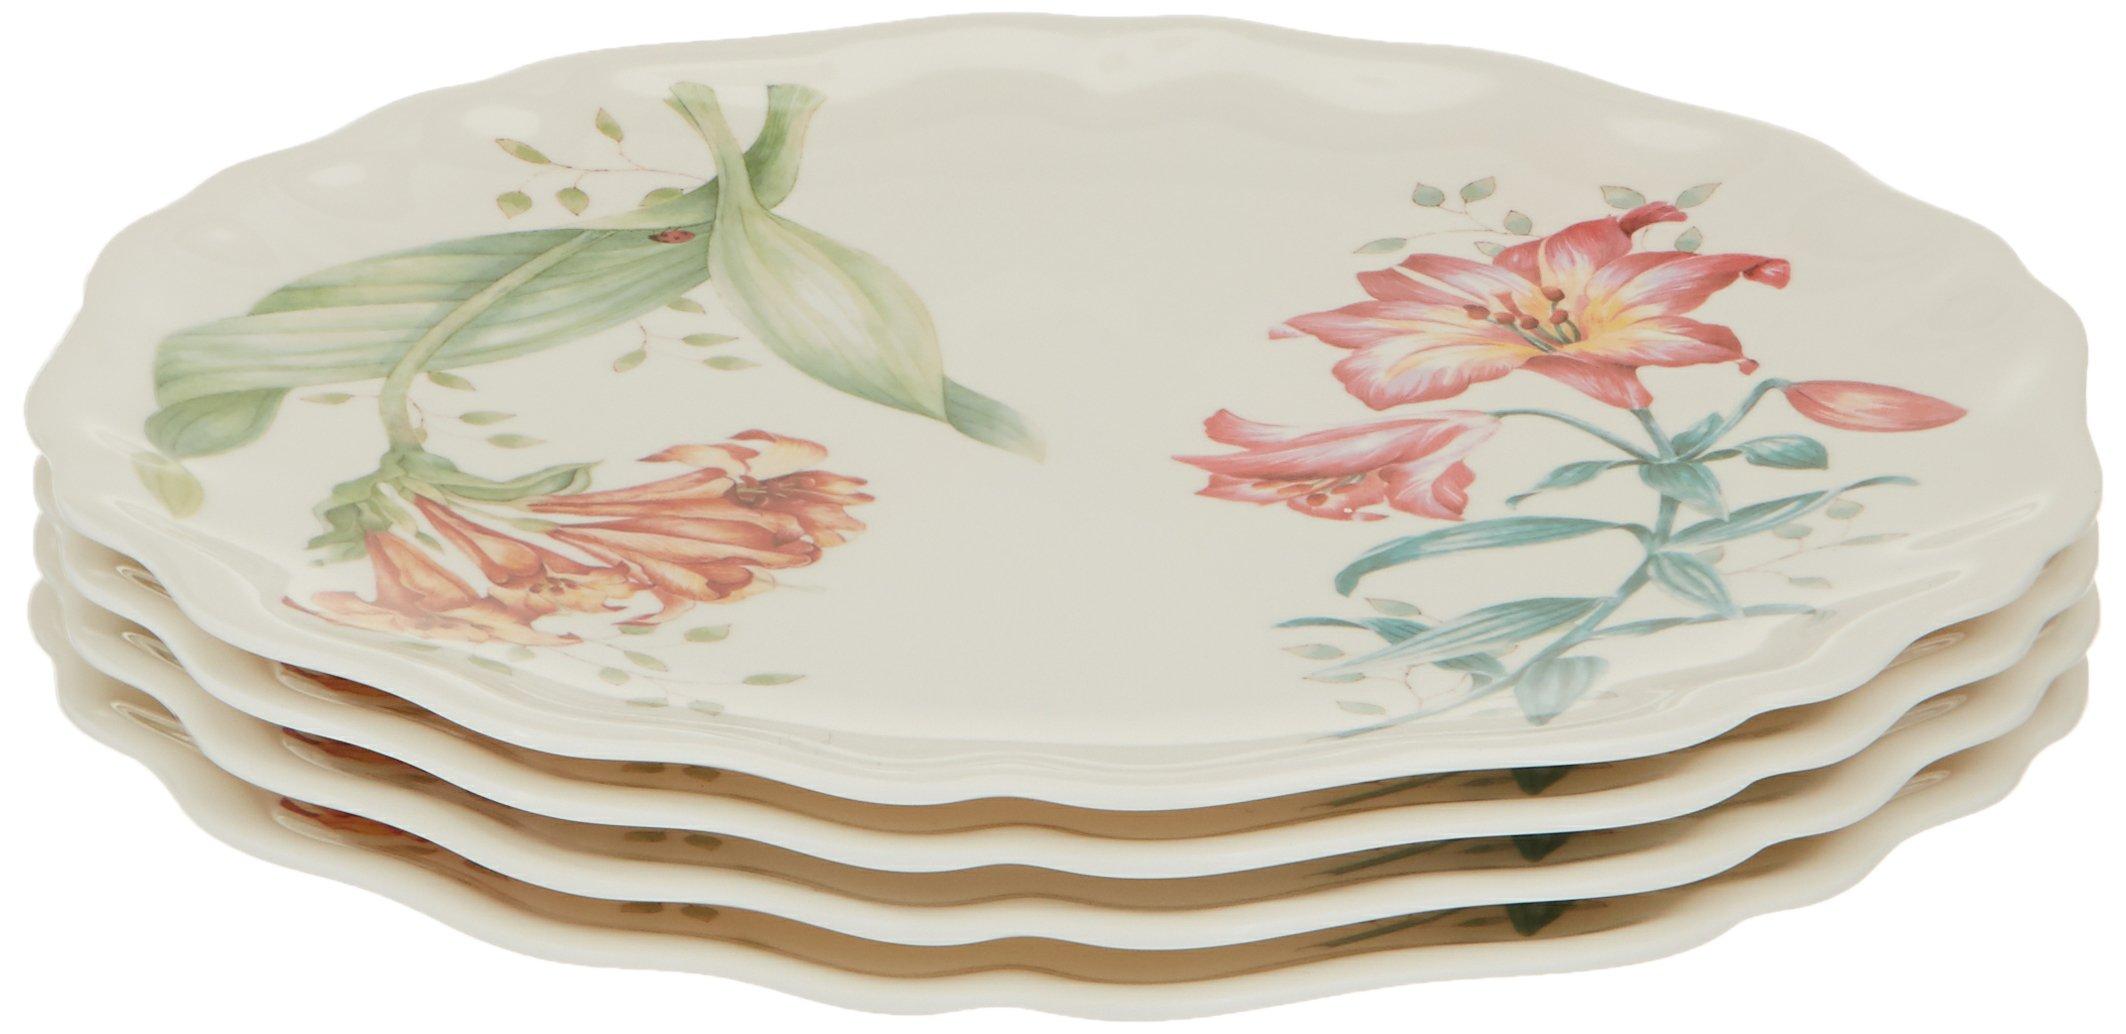 Lenox 856372 Plates, White